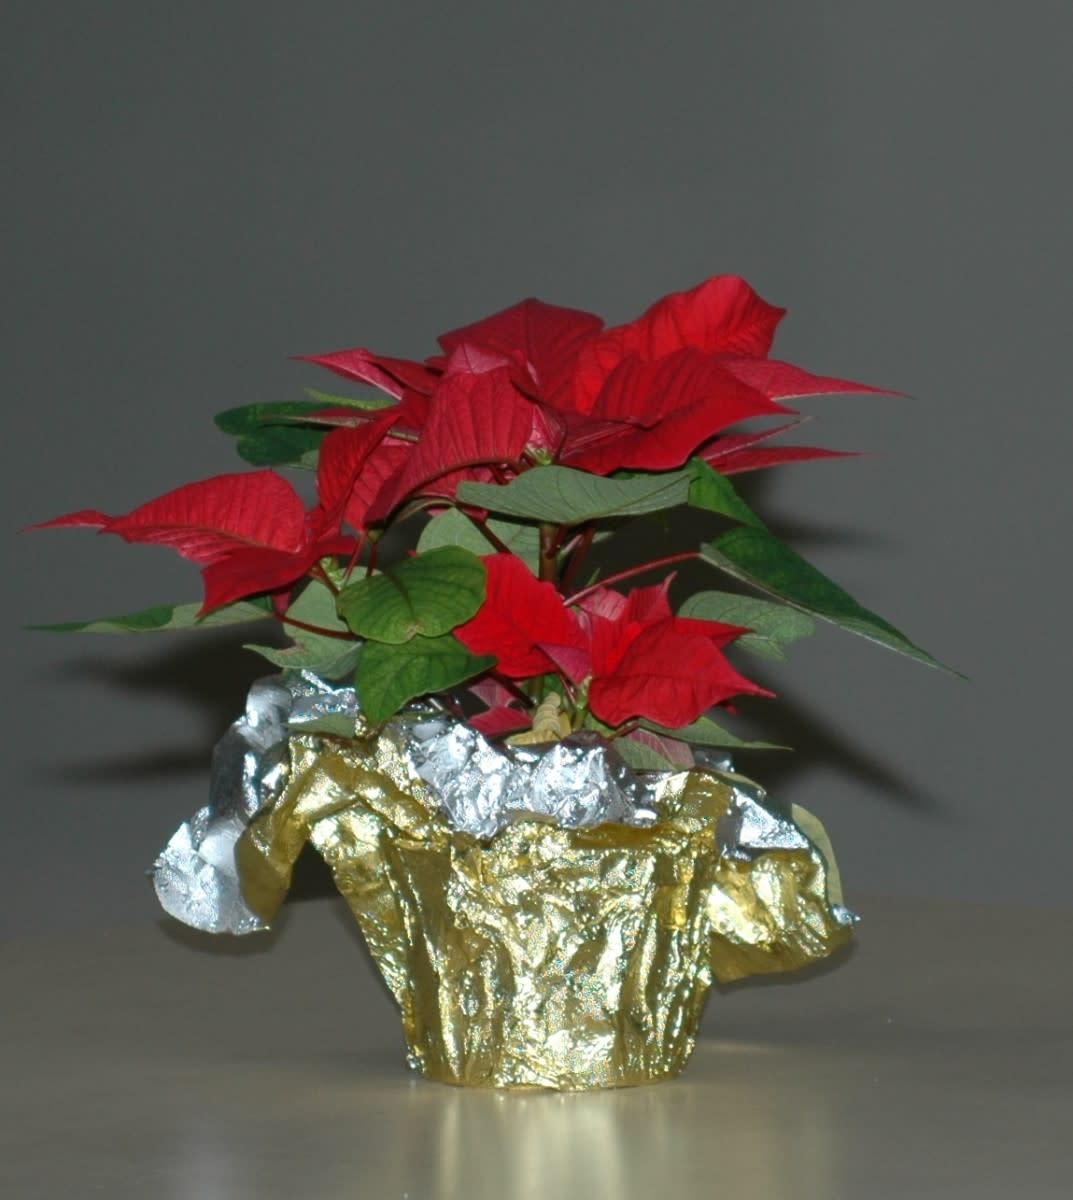 Poinsettias make the perfect gift!